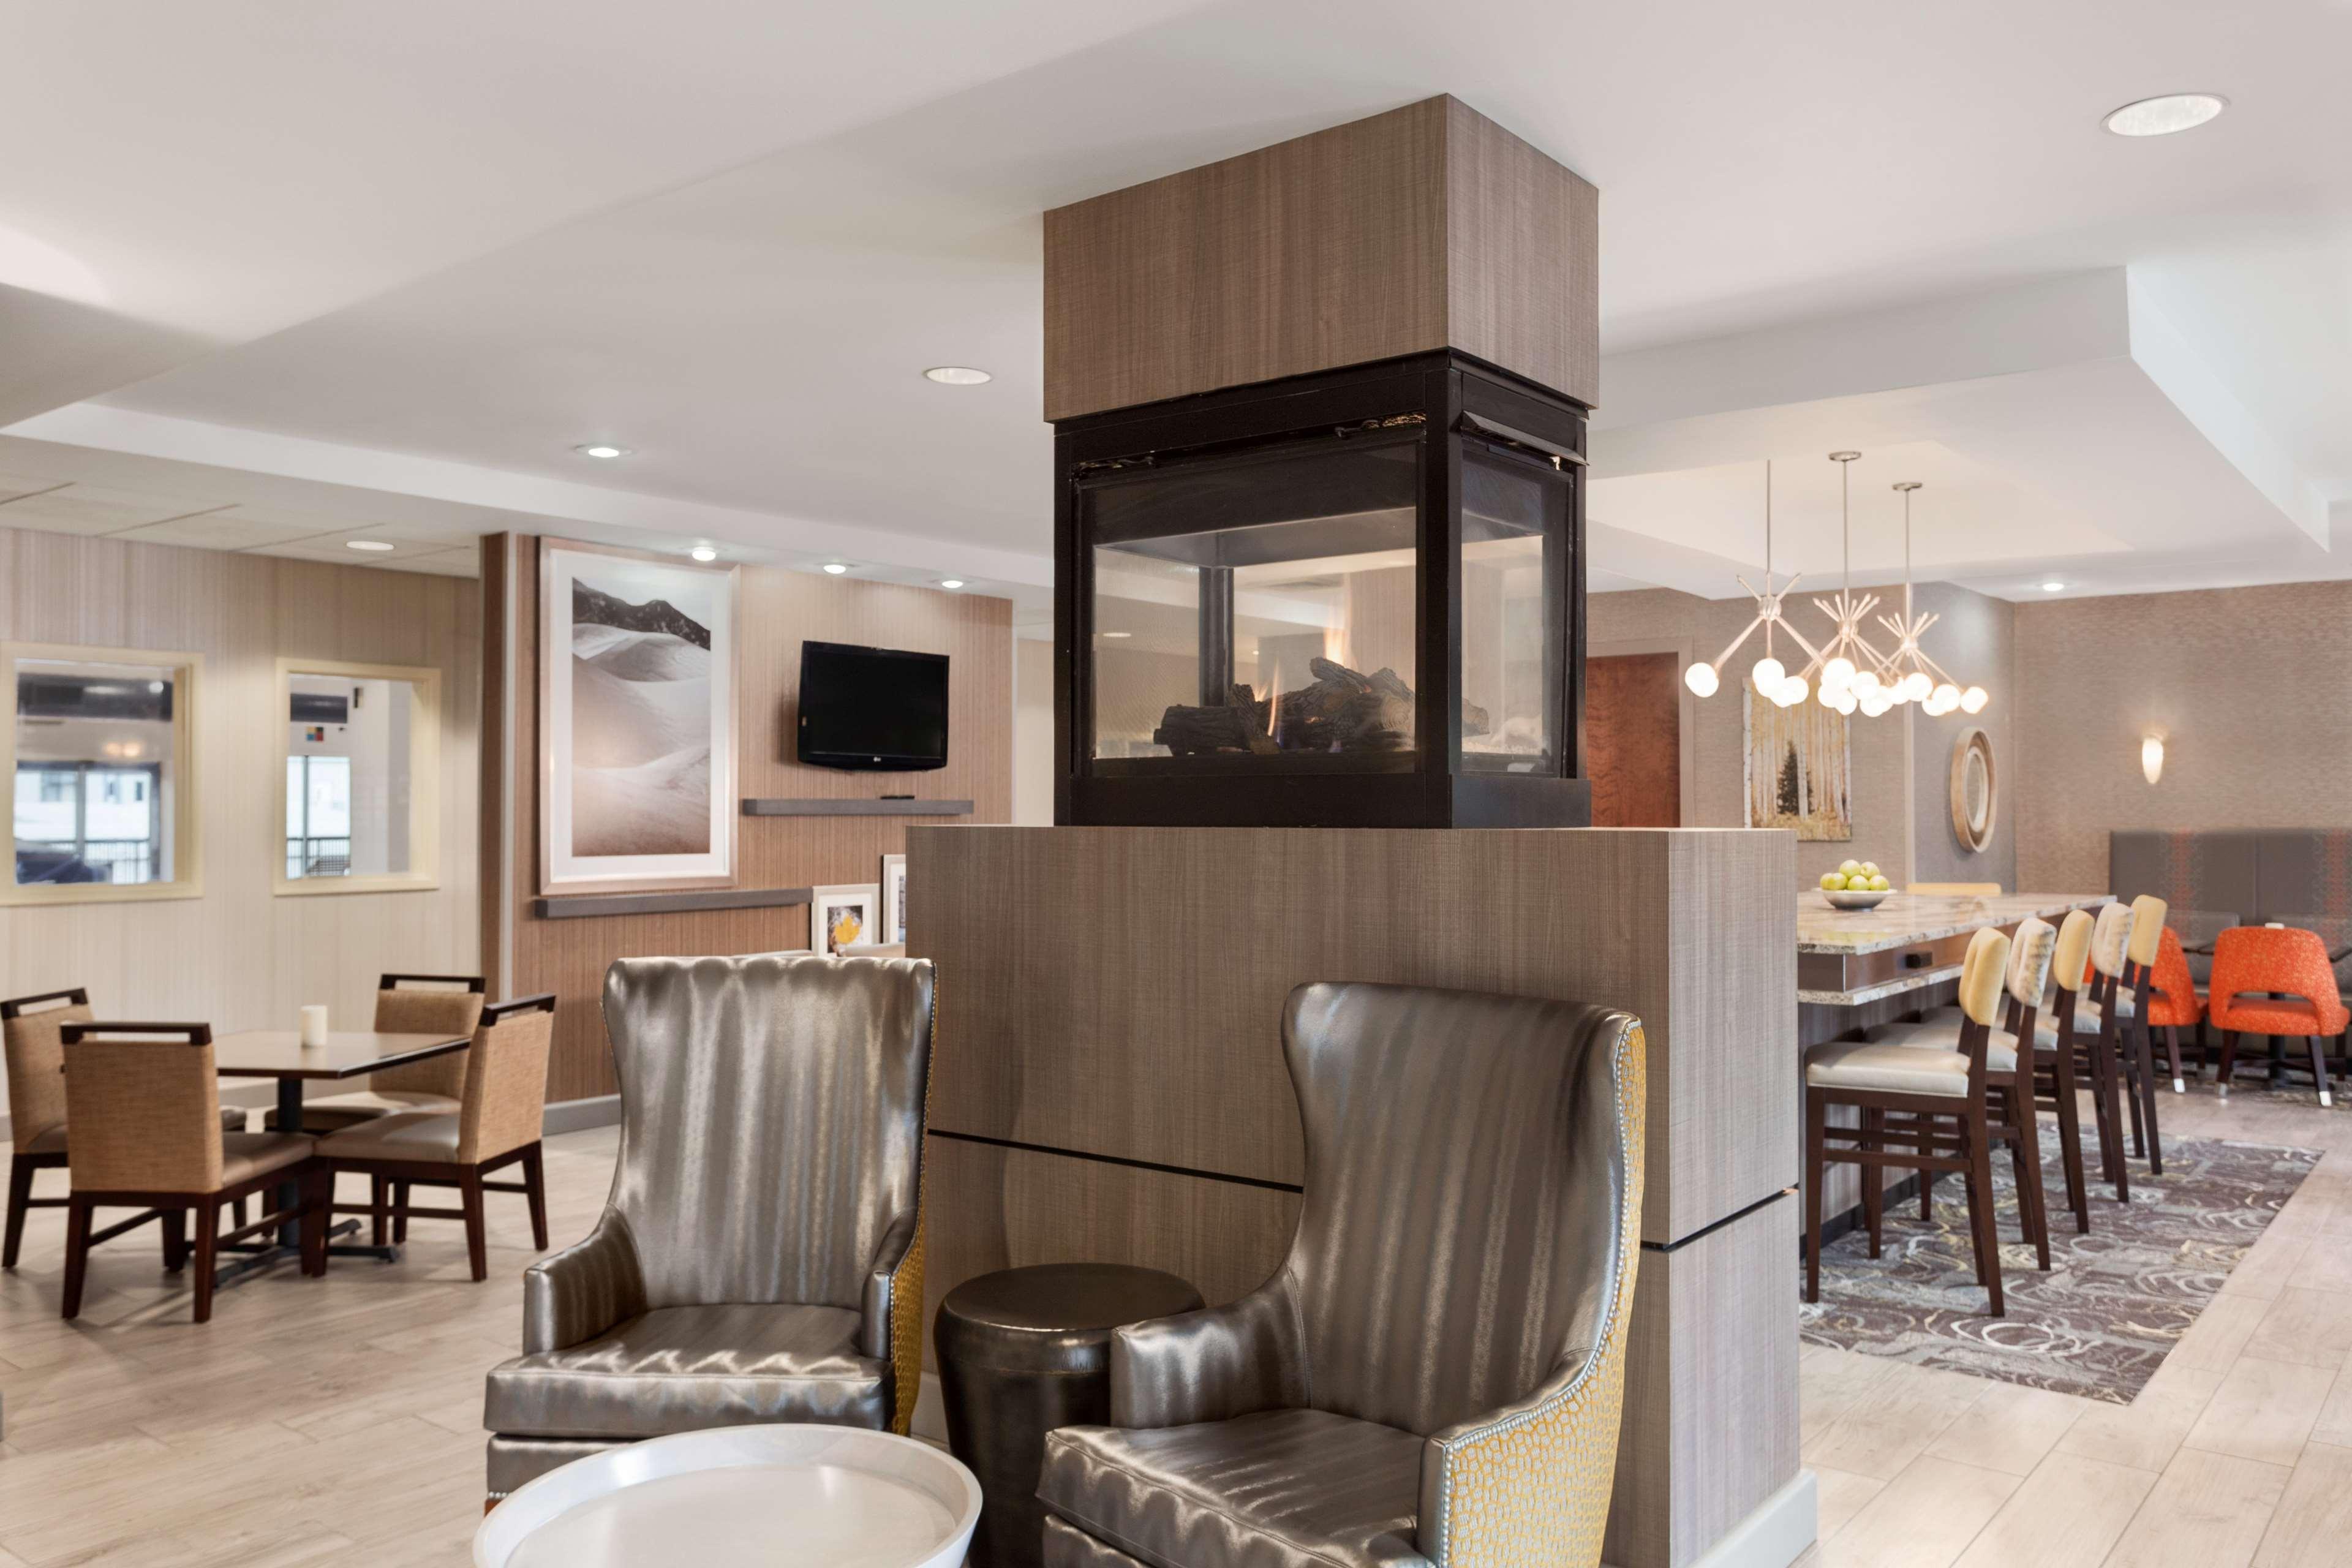 Hampton Inn & Suites Denver-Cherry Creek image 4